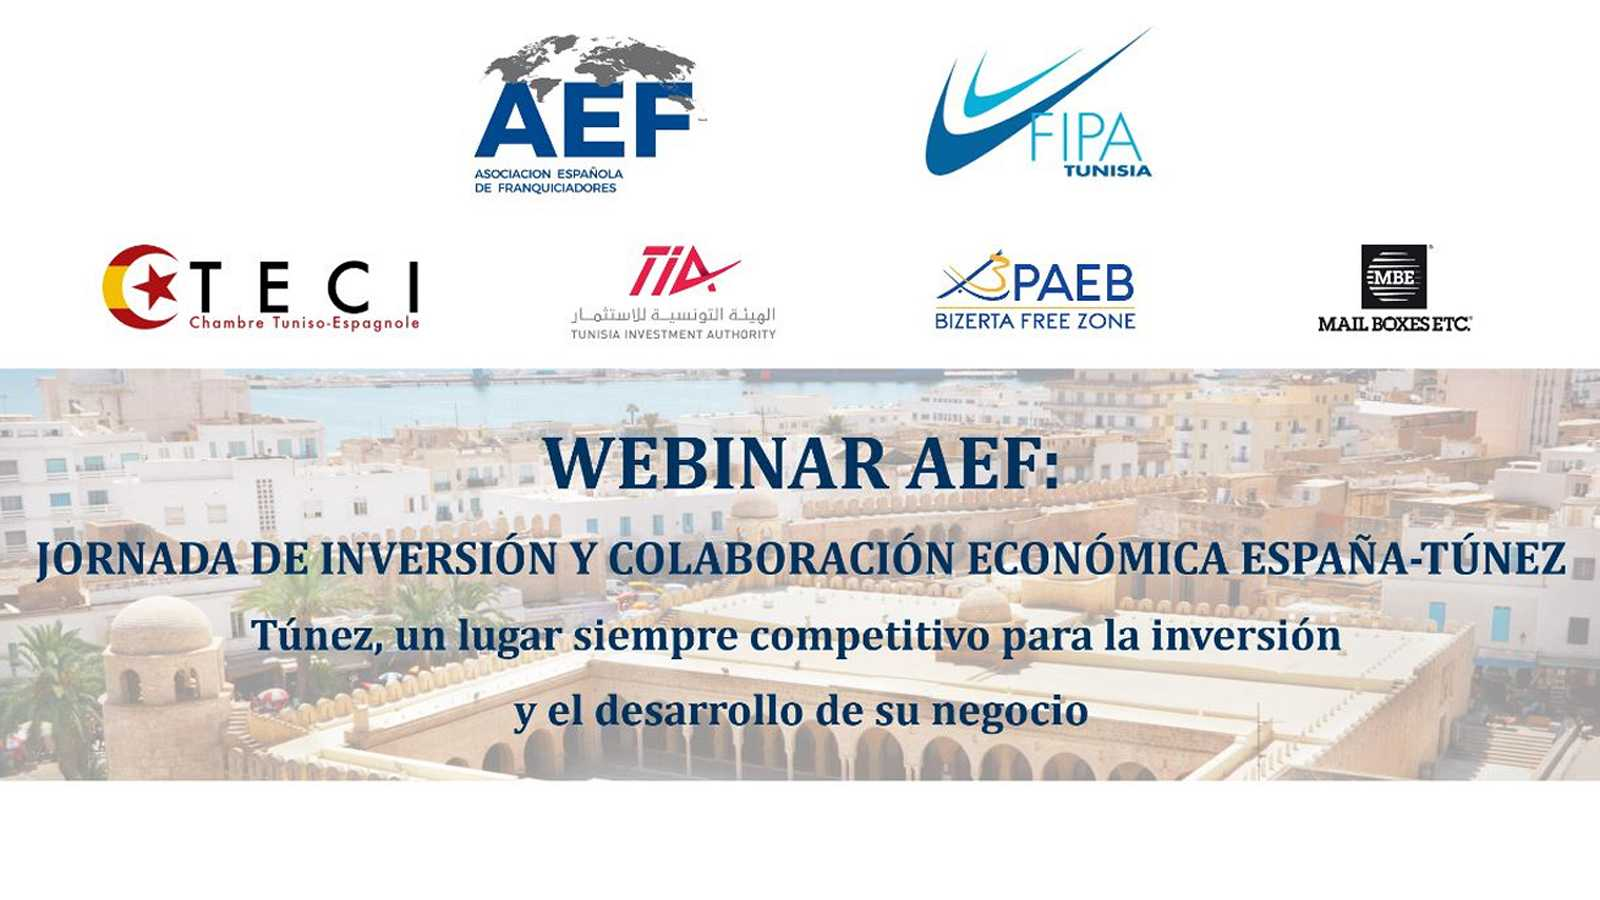 África hoy - Encuentro económico España-Túnez - 04/11/20 - escuchar ahora